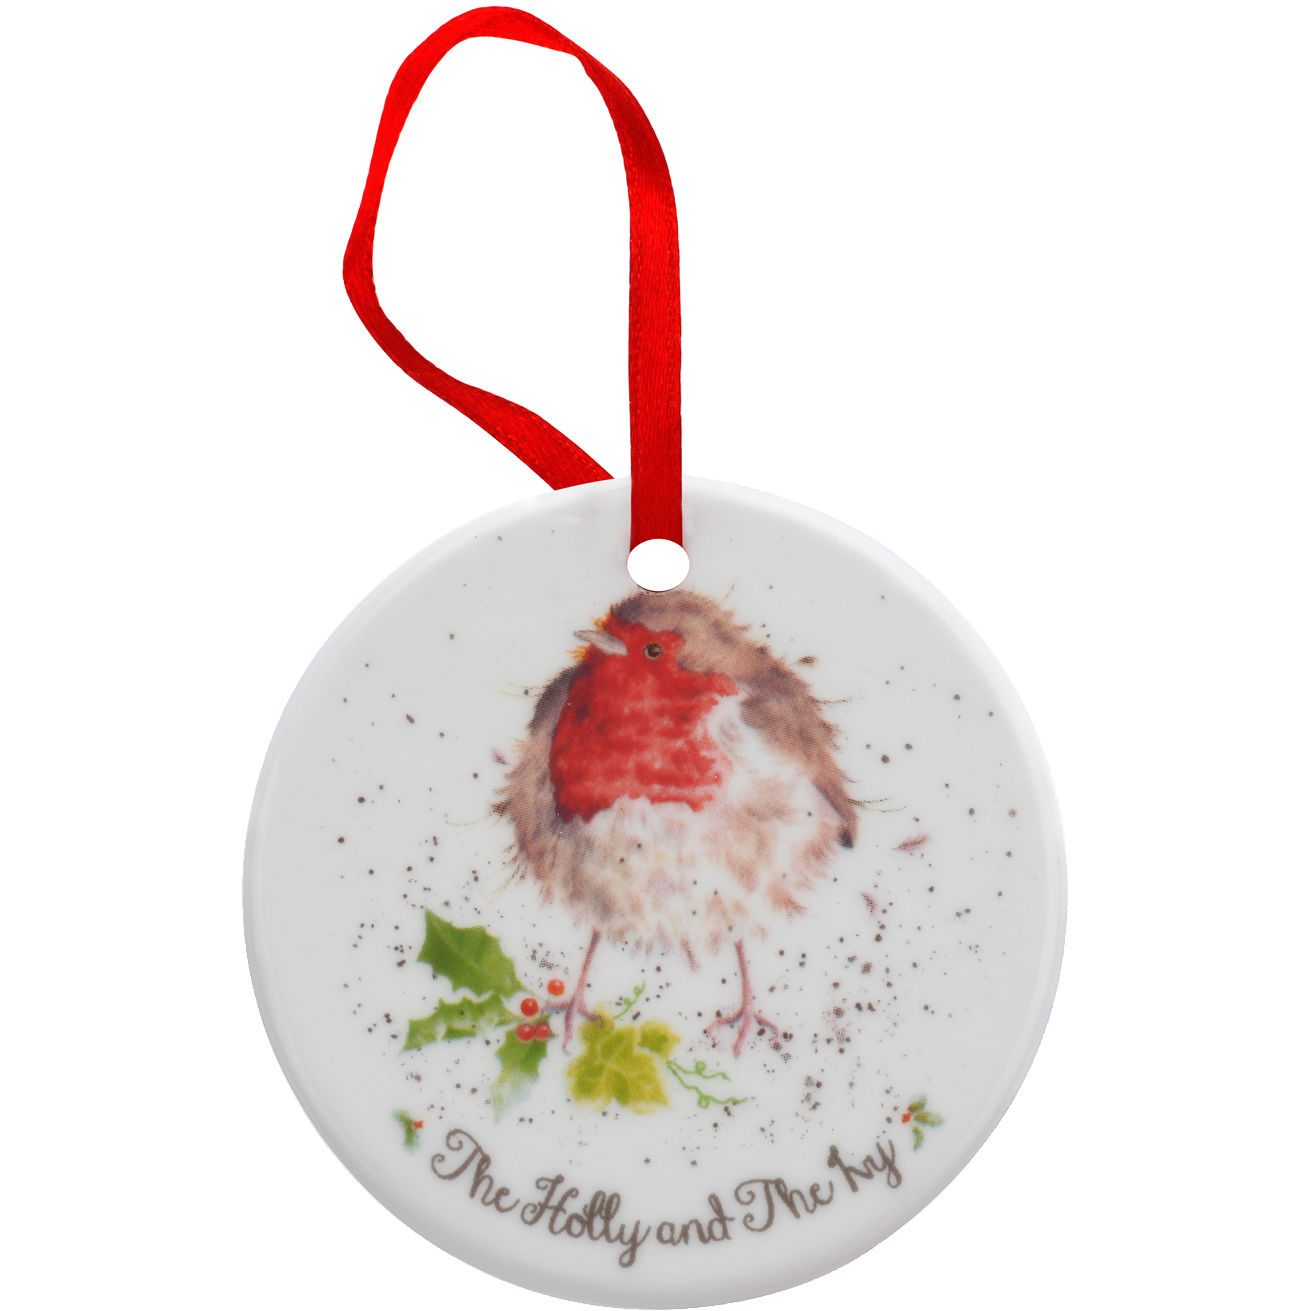 Wrendale Christmas Decoration Set of 6 | Louis Potts